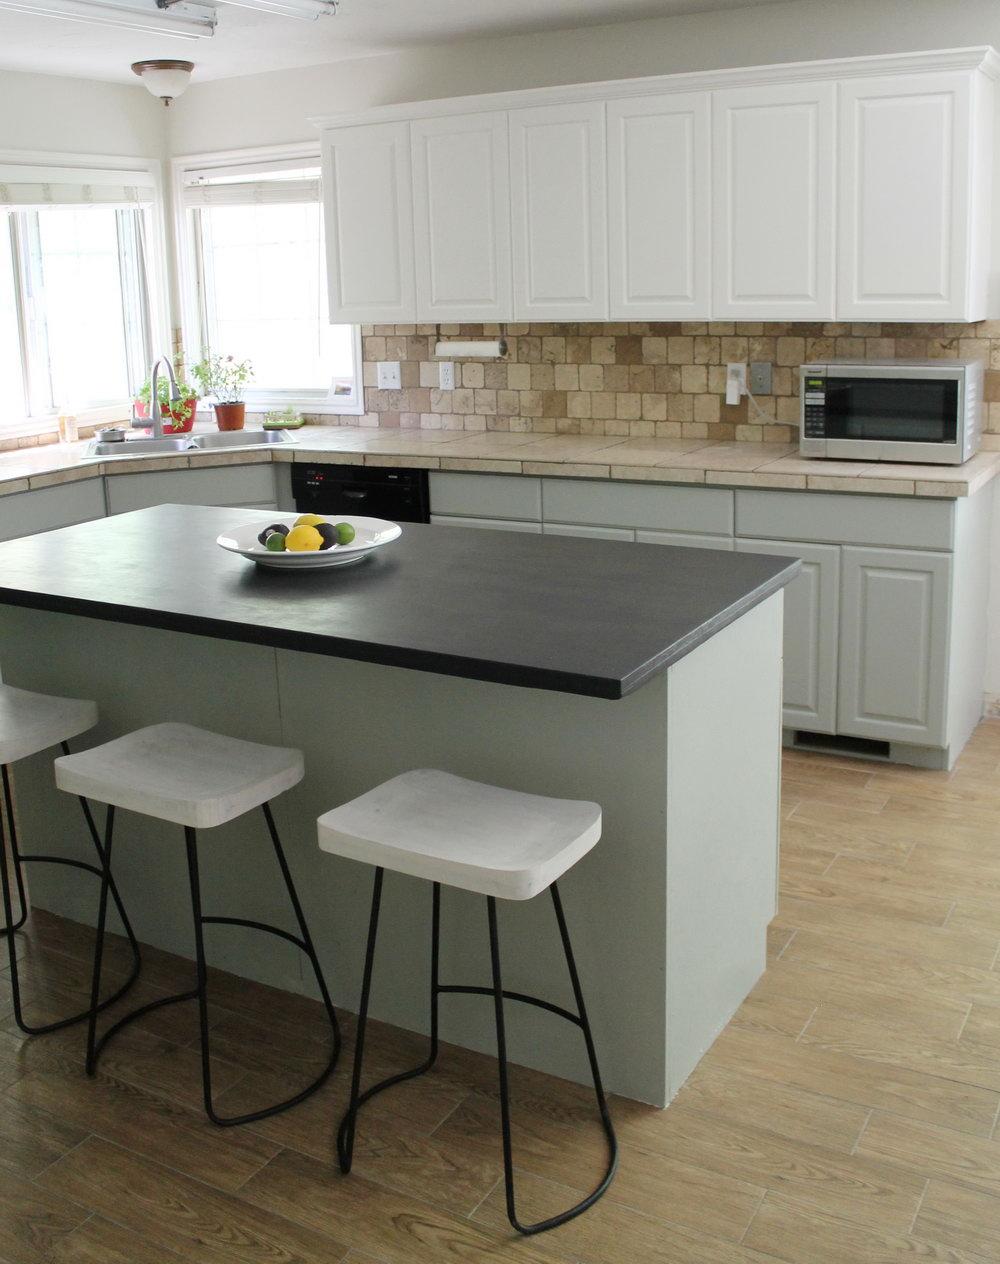 Removing Kitchen Cabinets Uk